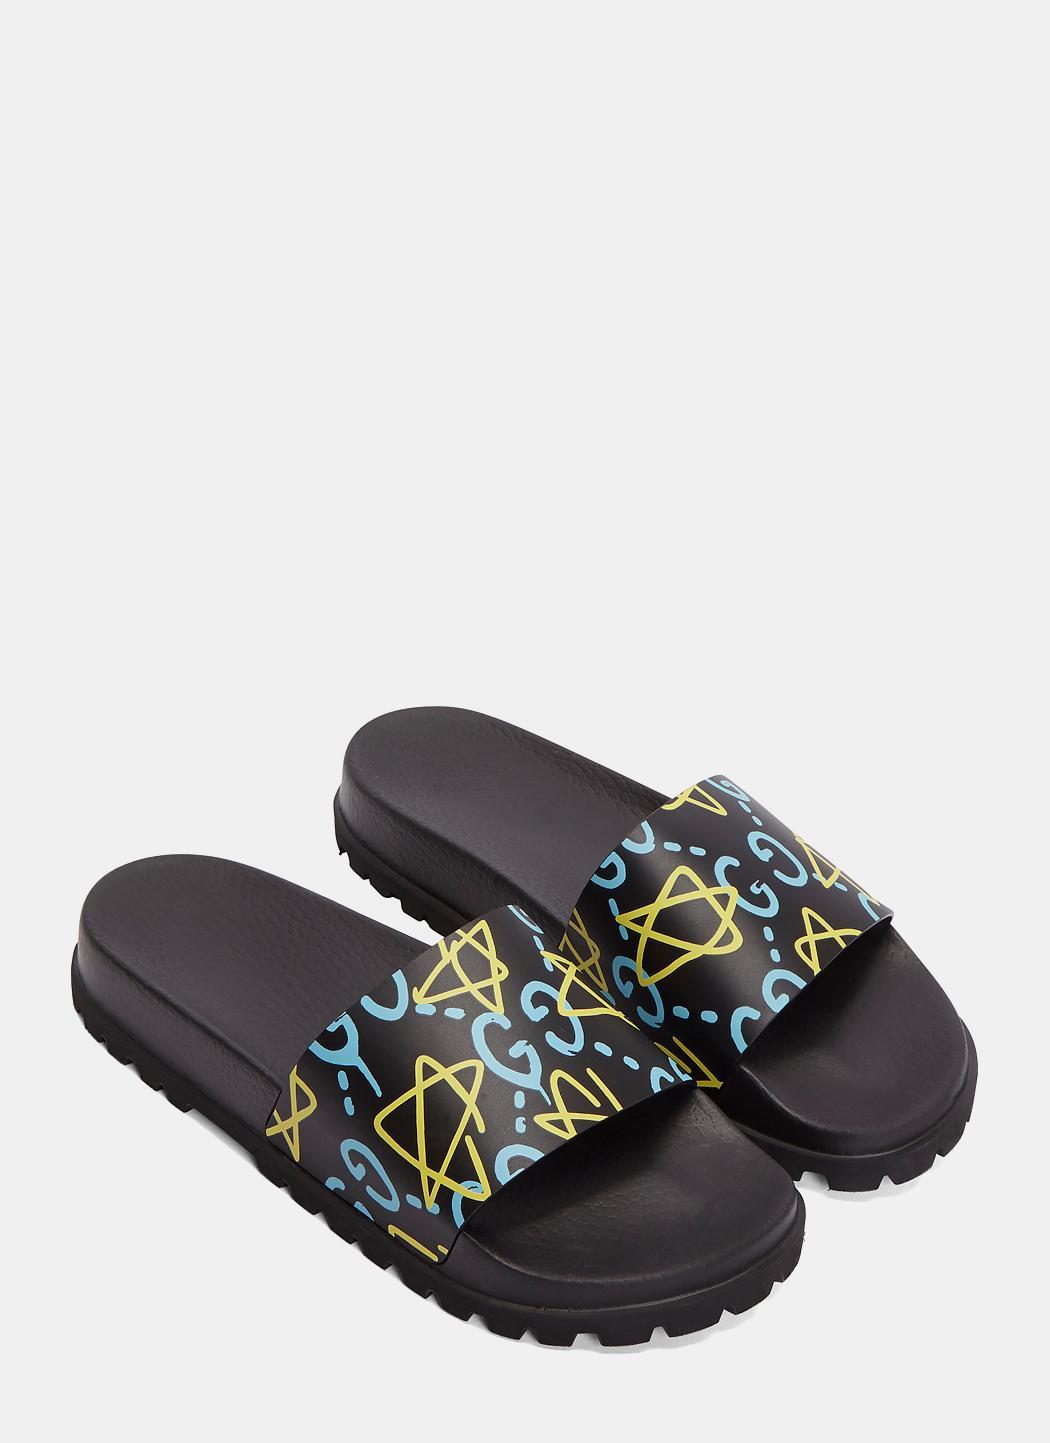 8d9418aaab87 Gucci Men s Ghost Sandal for Men - Lyst